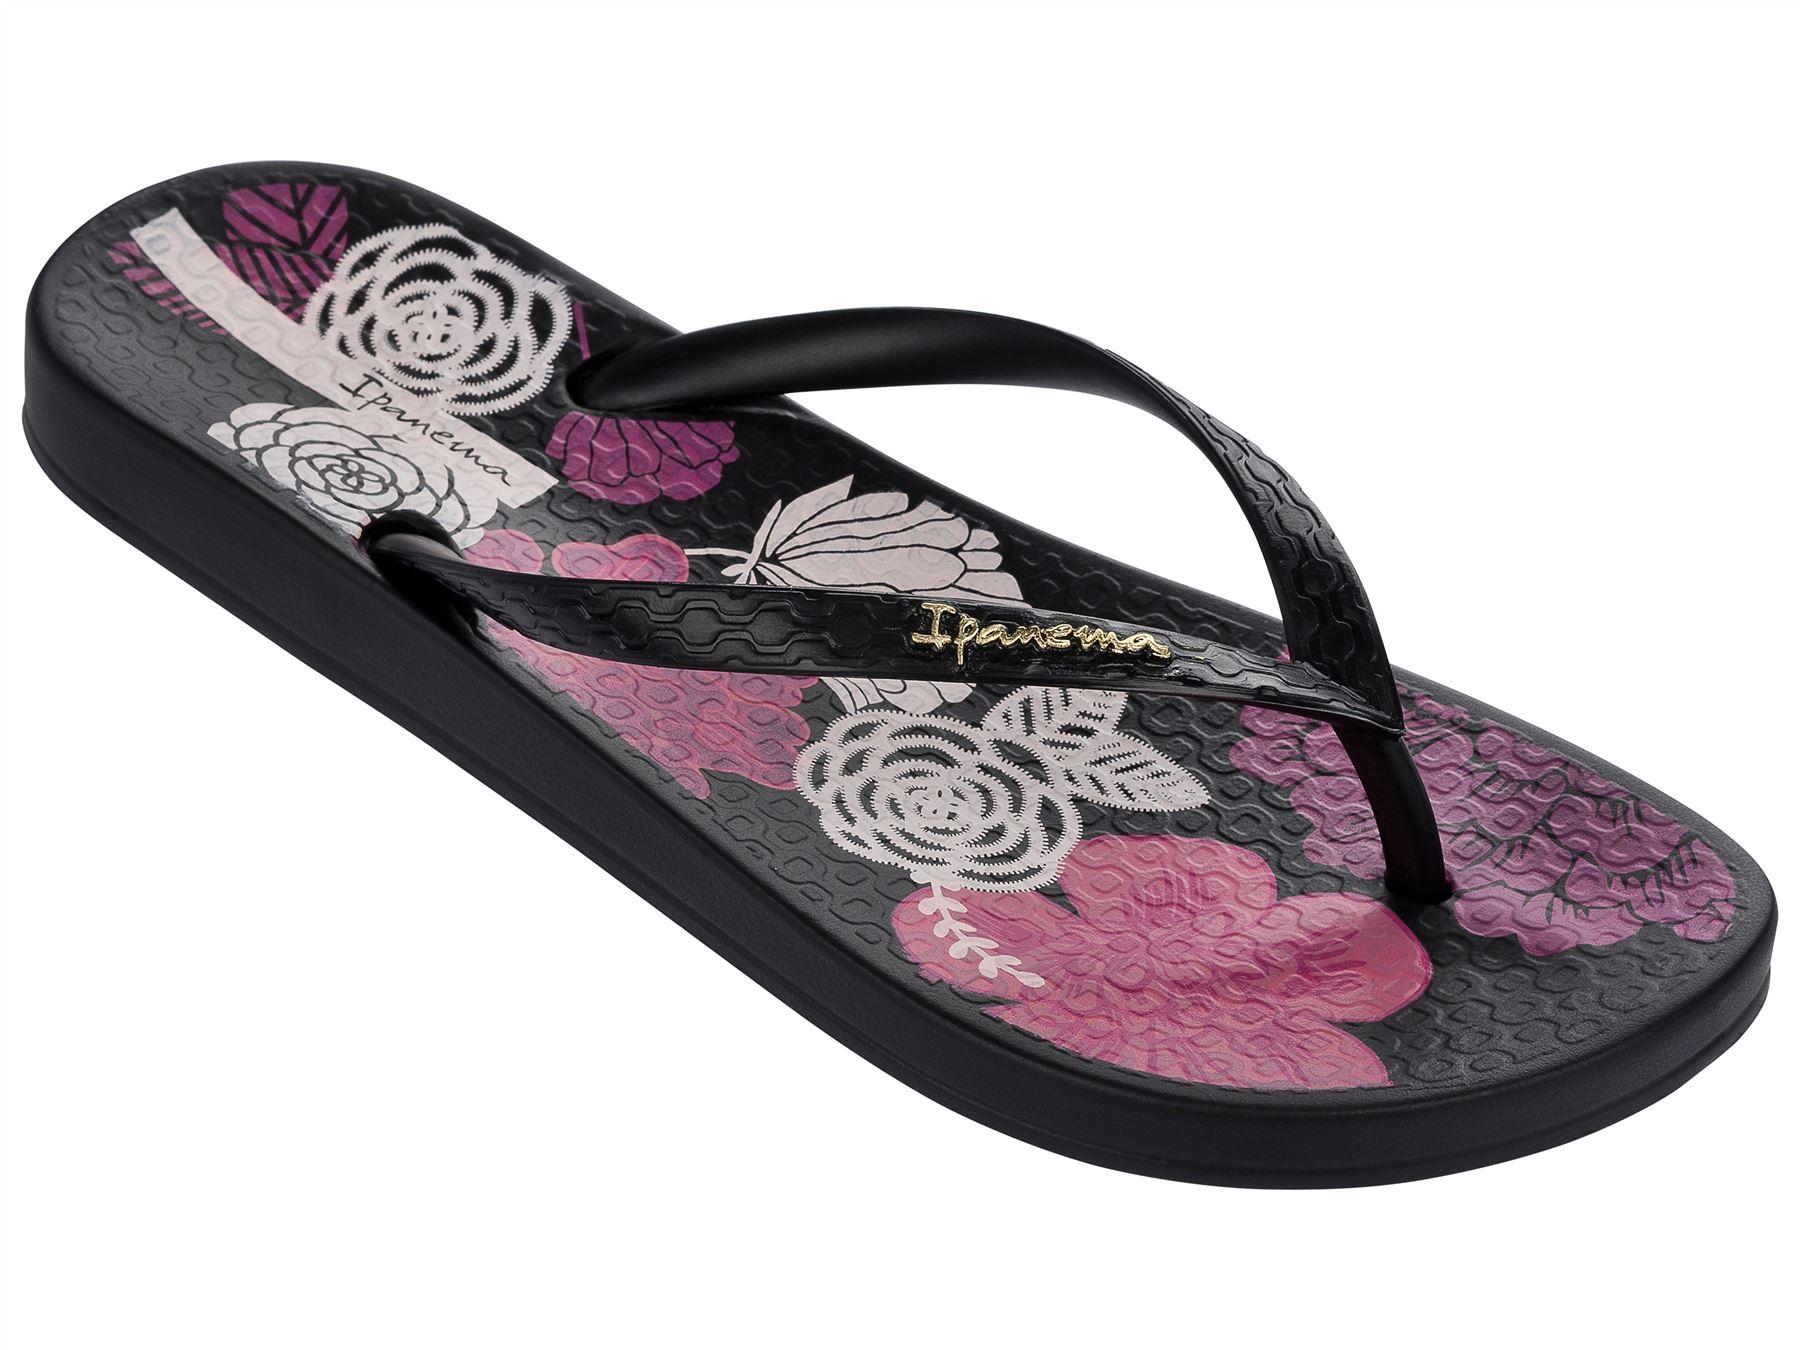 d45762a0b4e0 Ipanema Petal V Flowers Print Slim Footbed Flip Flops Beach Sandals 81924.  Description A tropical floral print brings charm to this feminine style.